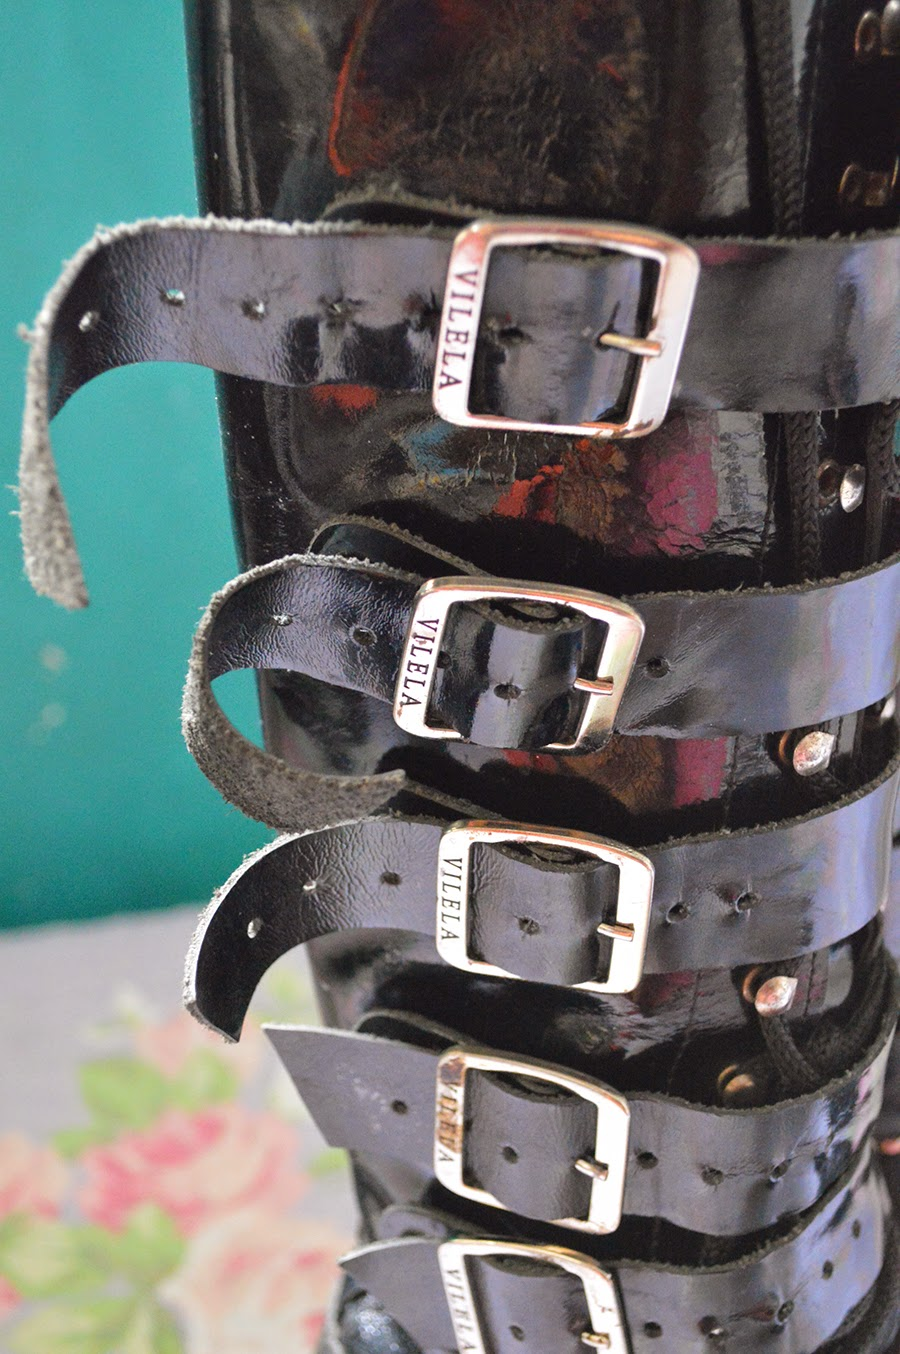 Coturno Plataforma Vilela Boots Resenha